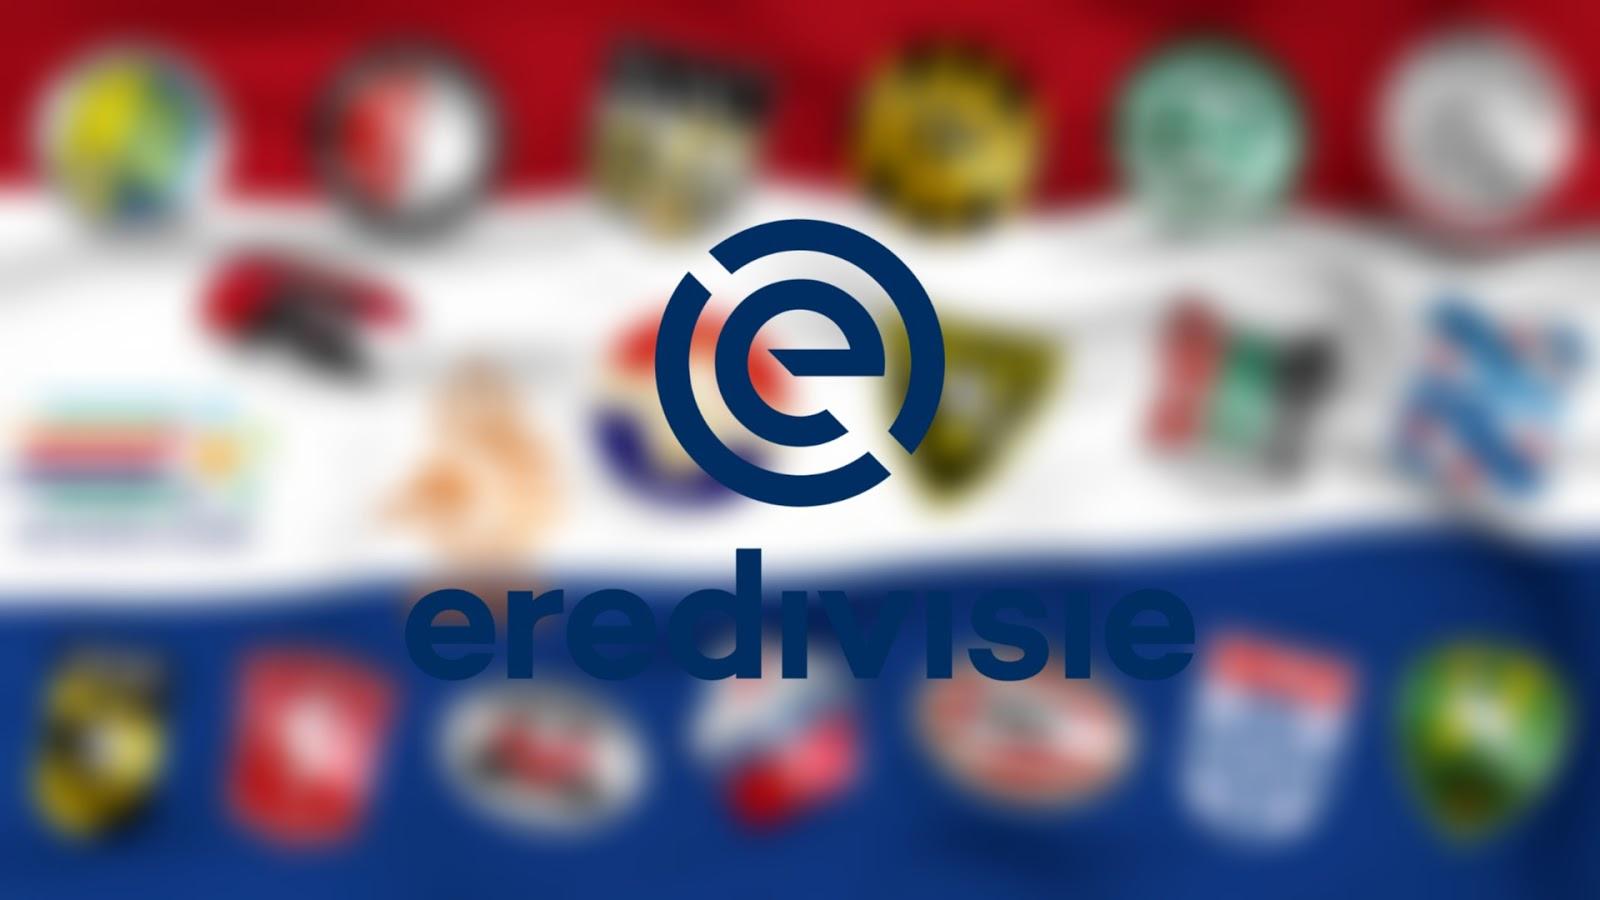 Jadual Eredivisie 2019/2020 Liga Belanda (Keputusan)